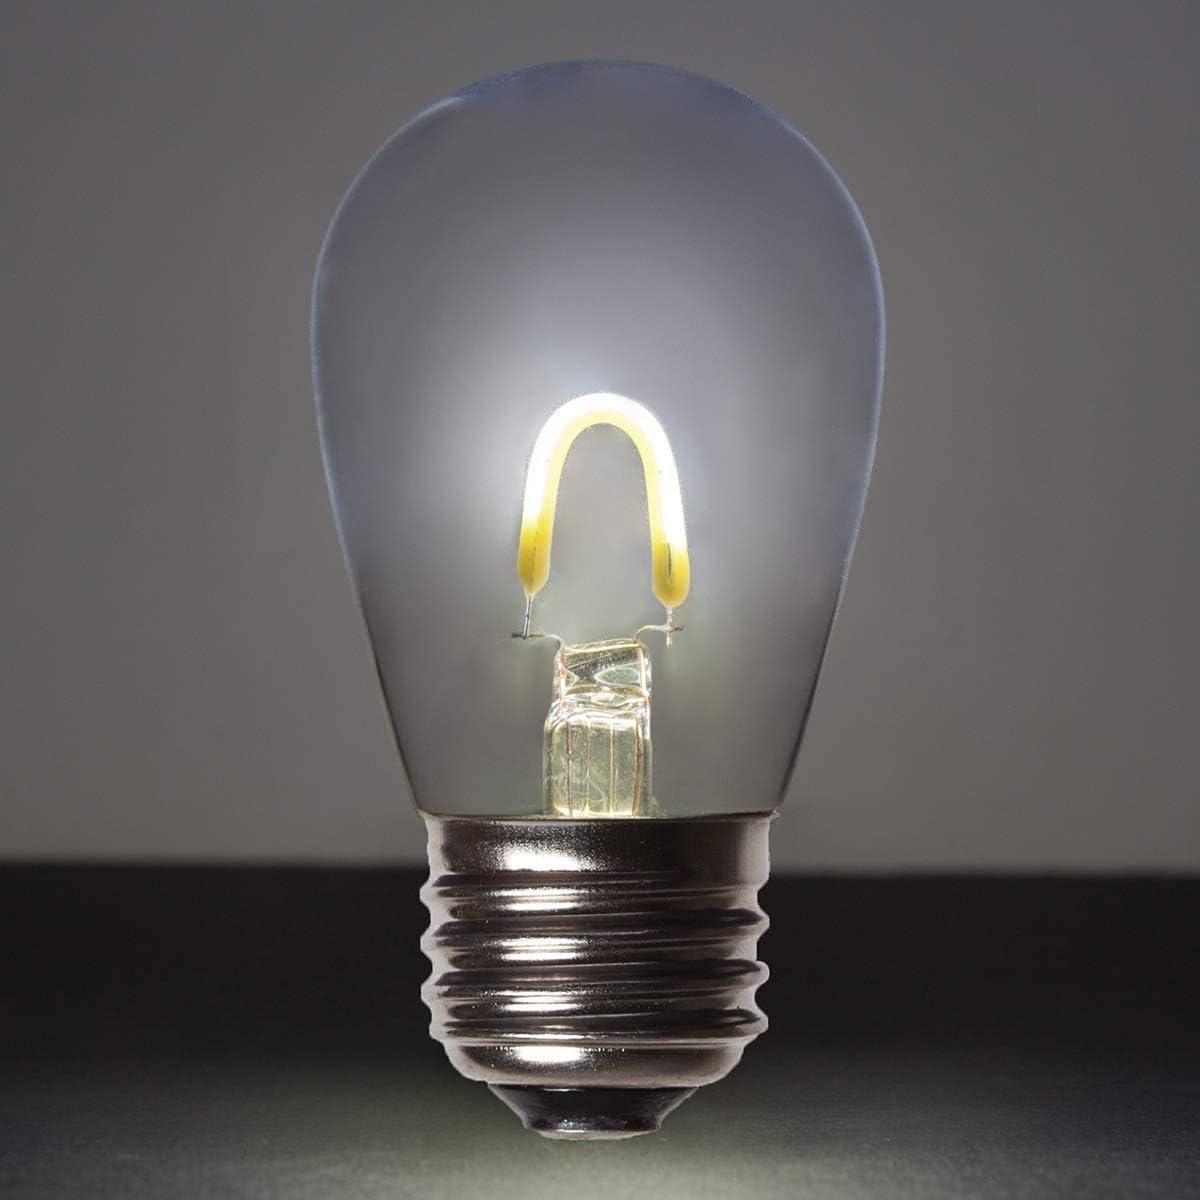 Glass, Cool White Wintergreen Lighting 5 Pack Cool White FlexFilament S14 LED Edison Light Bulbs 1W Bistro Lights Backyard Lights Patio String Lights LED Decorative Lights